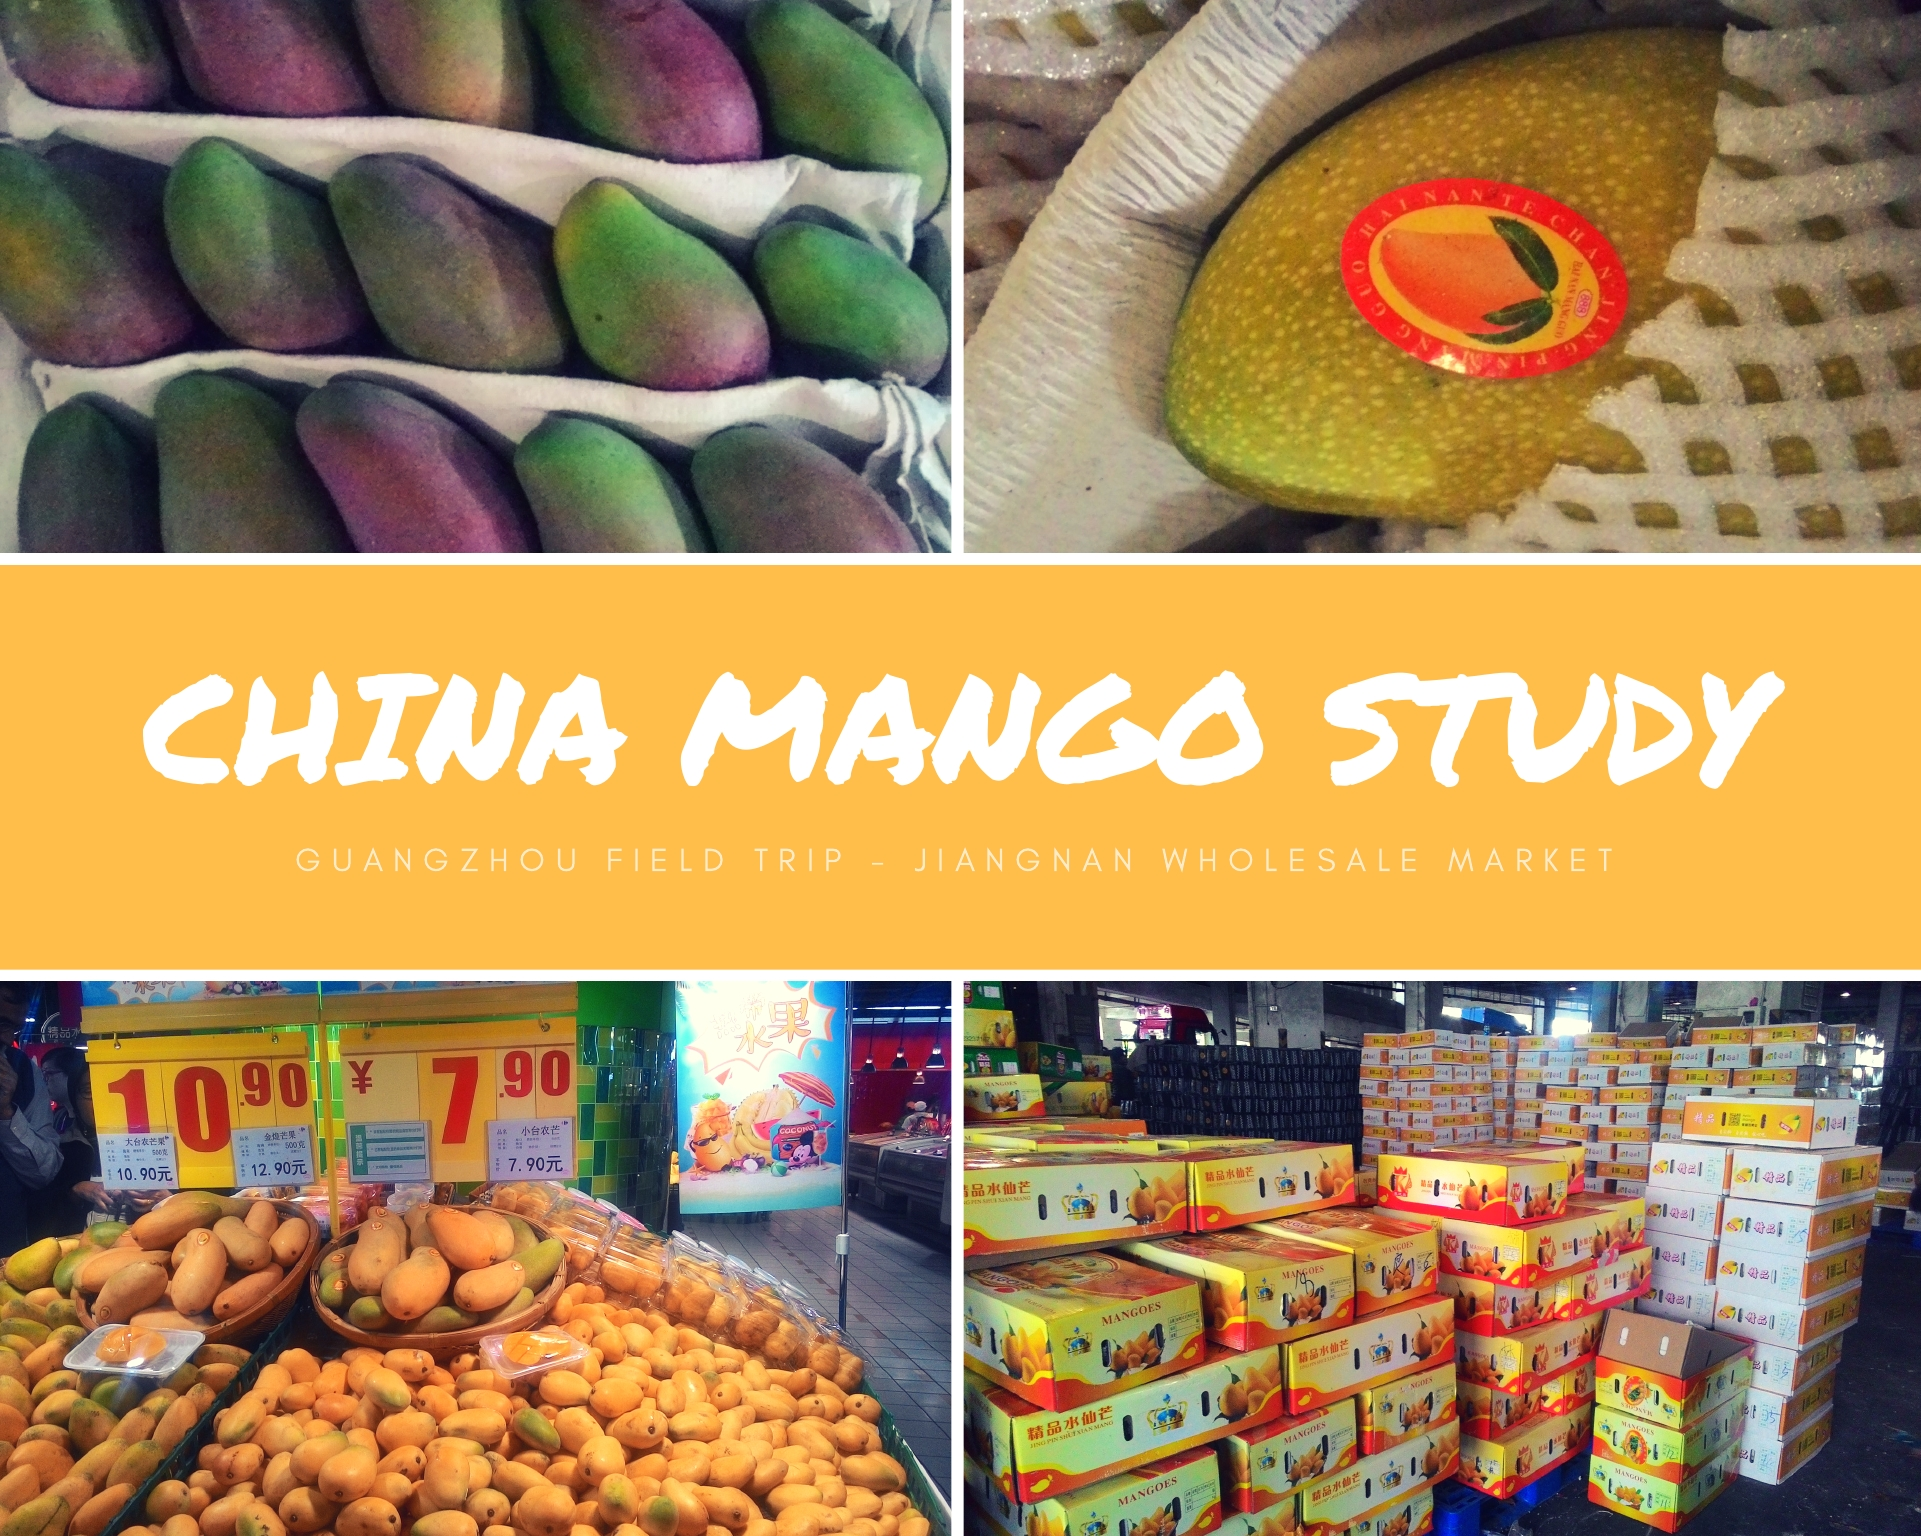 China Mango Study- Guangzhou Field Trip